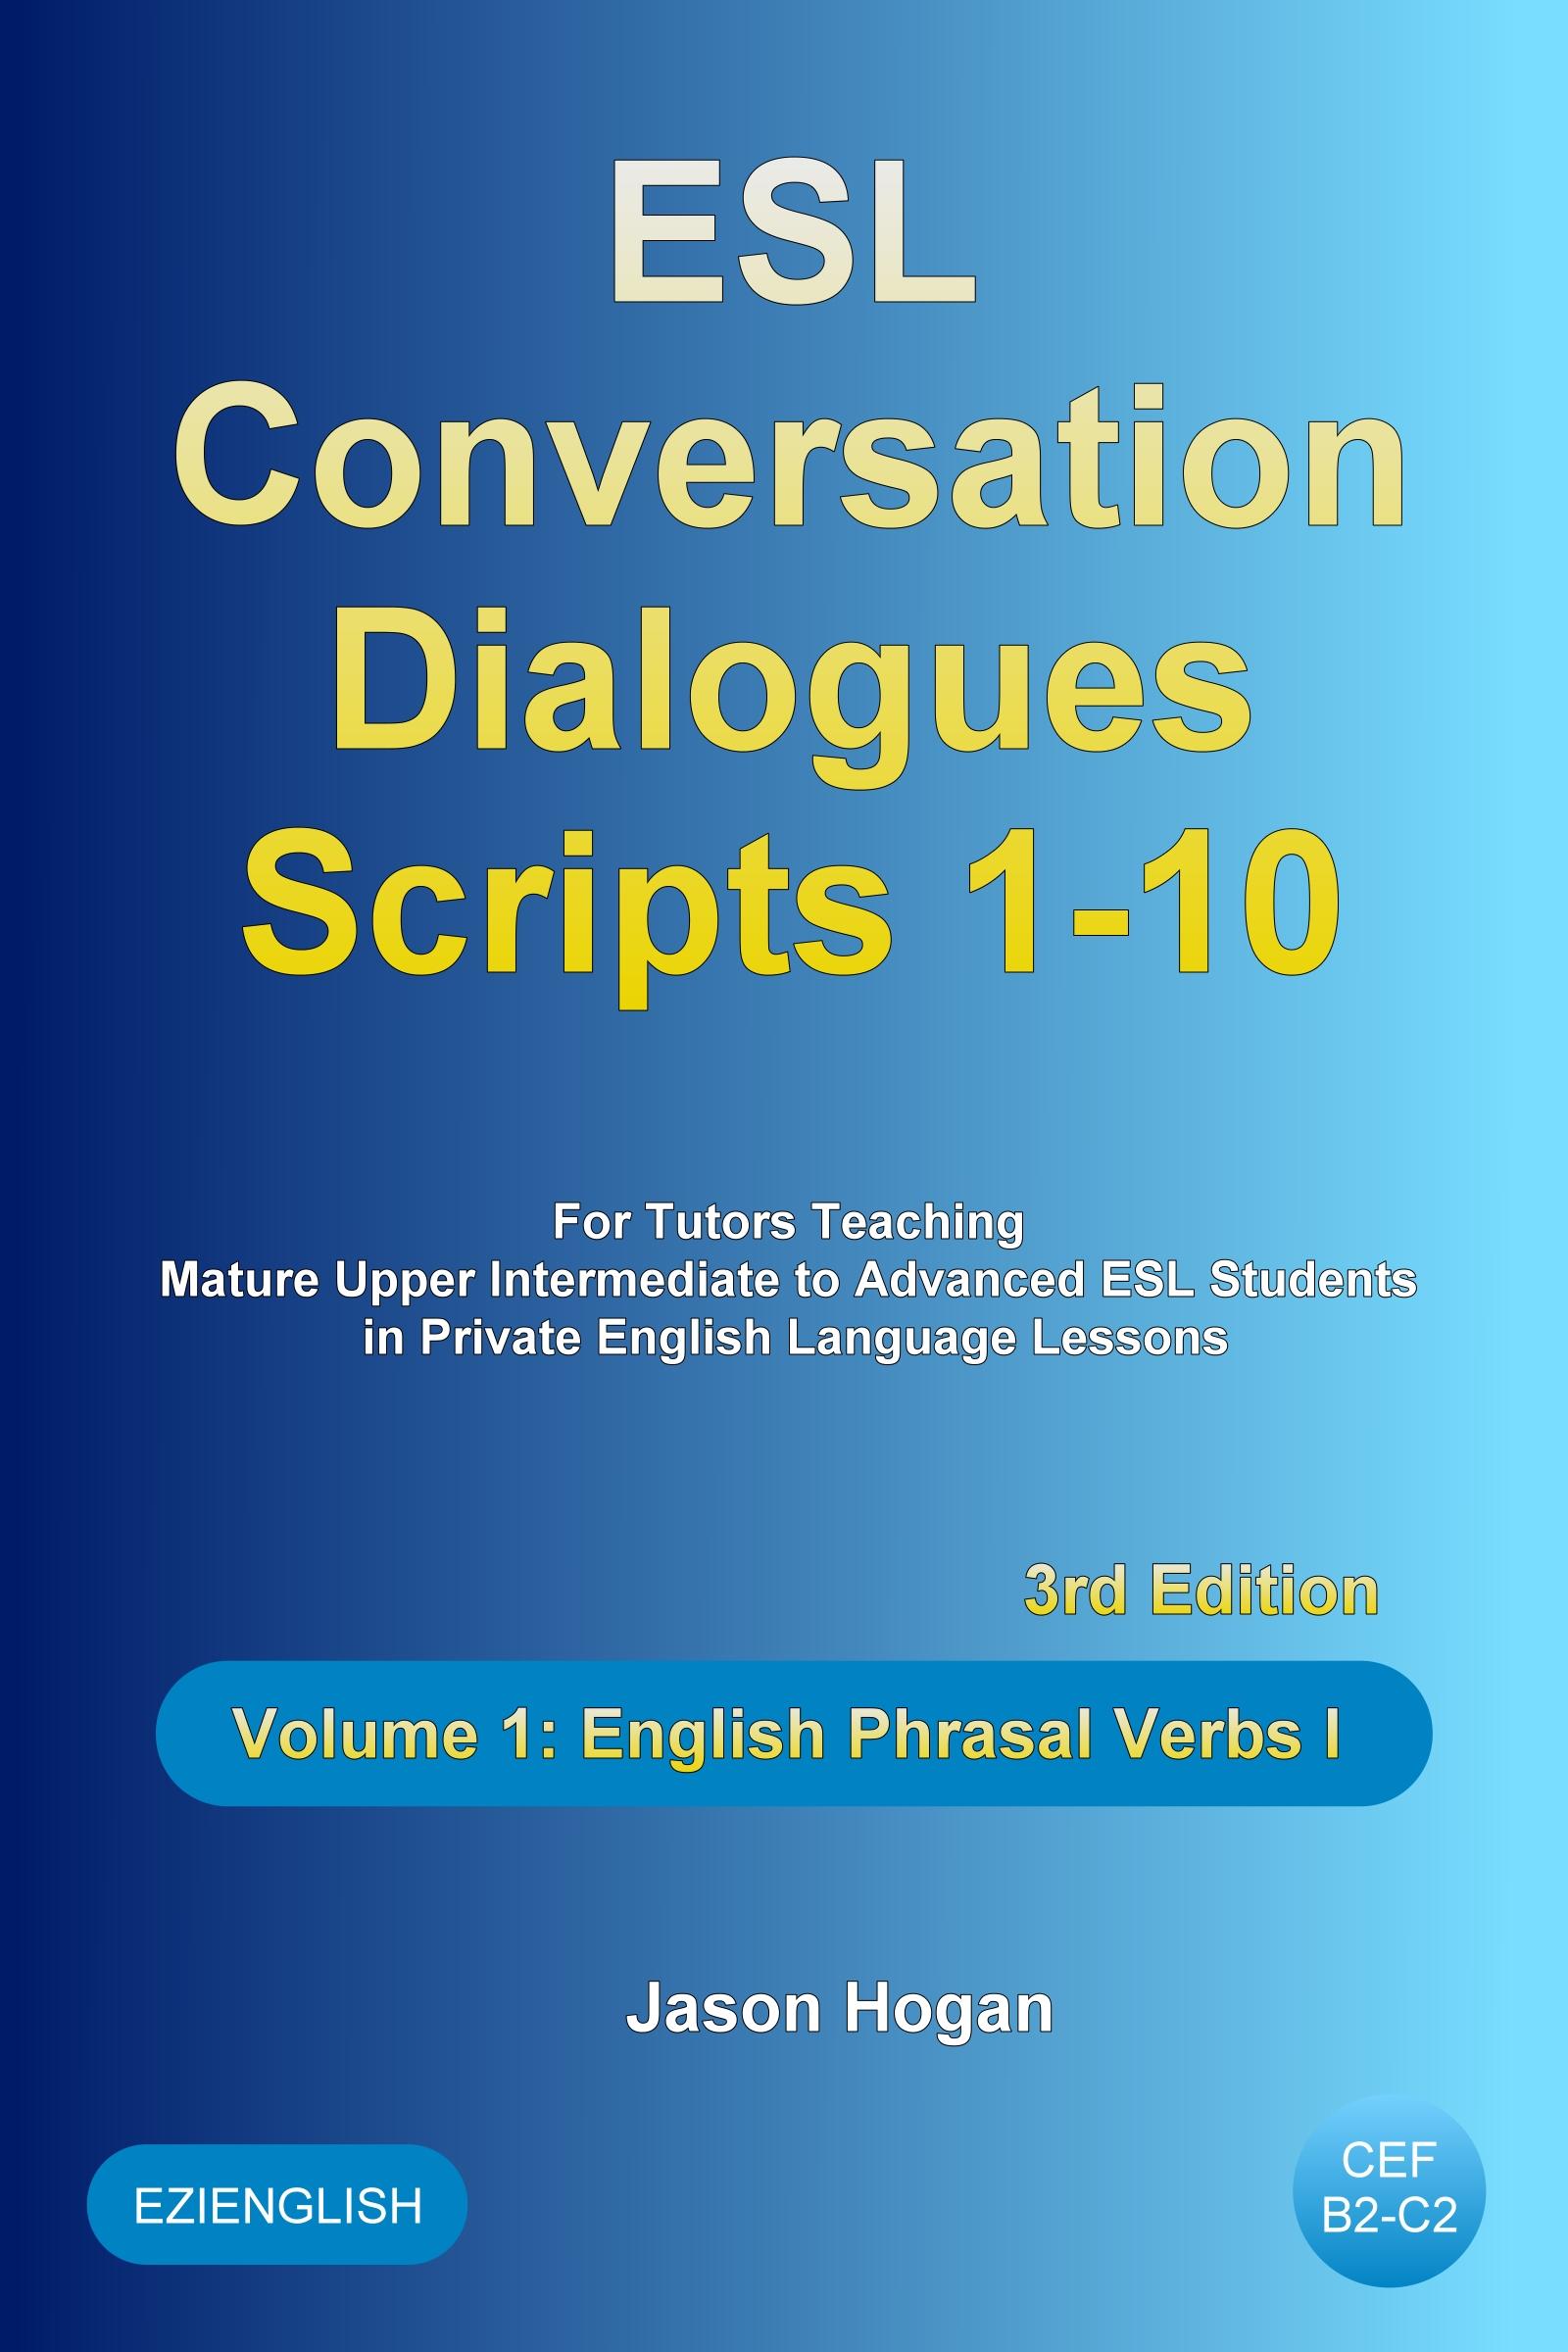 ESL Conversation Dialogues Scripts 1-10 Volume 1: English Phrasal Verbs I,  an Ebook by Jason Hogan